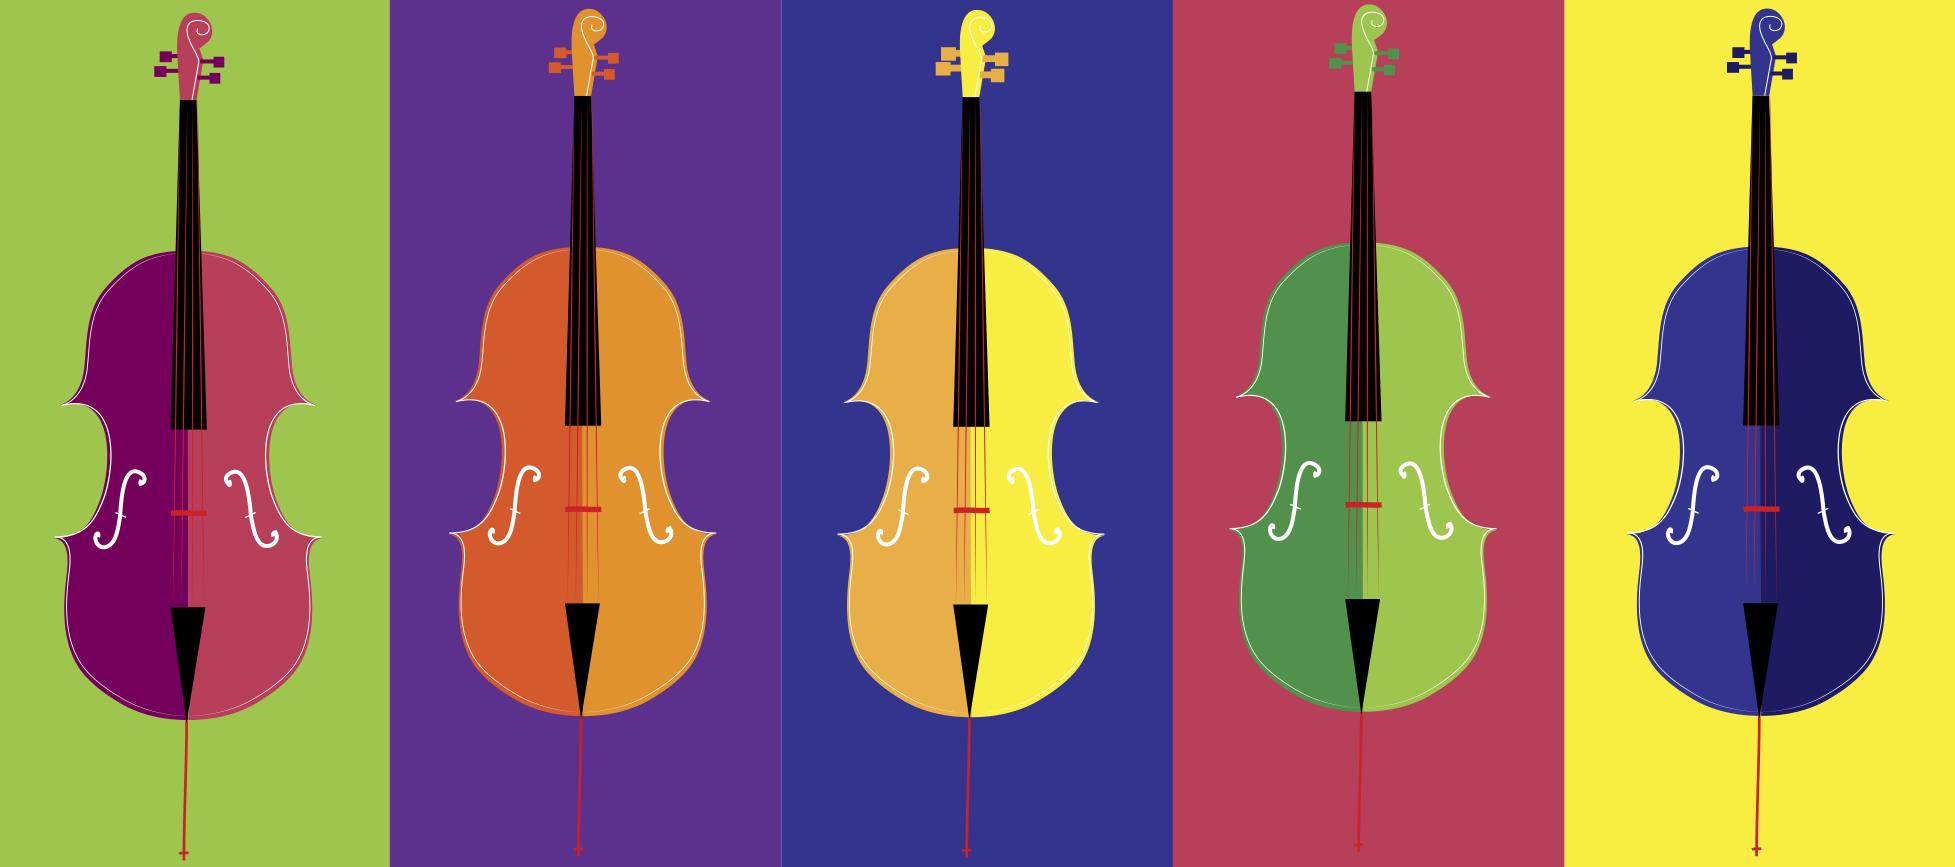 Online Cello School